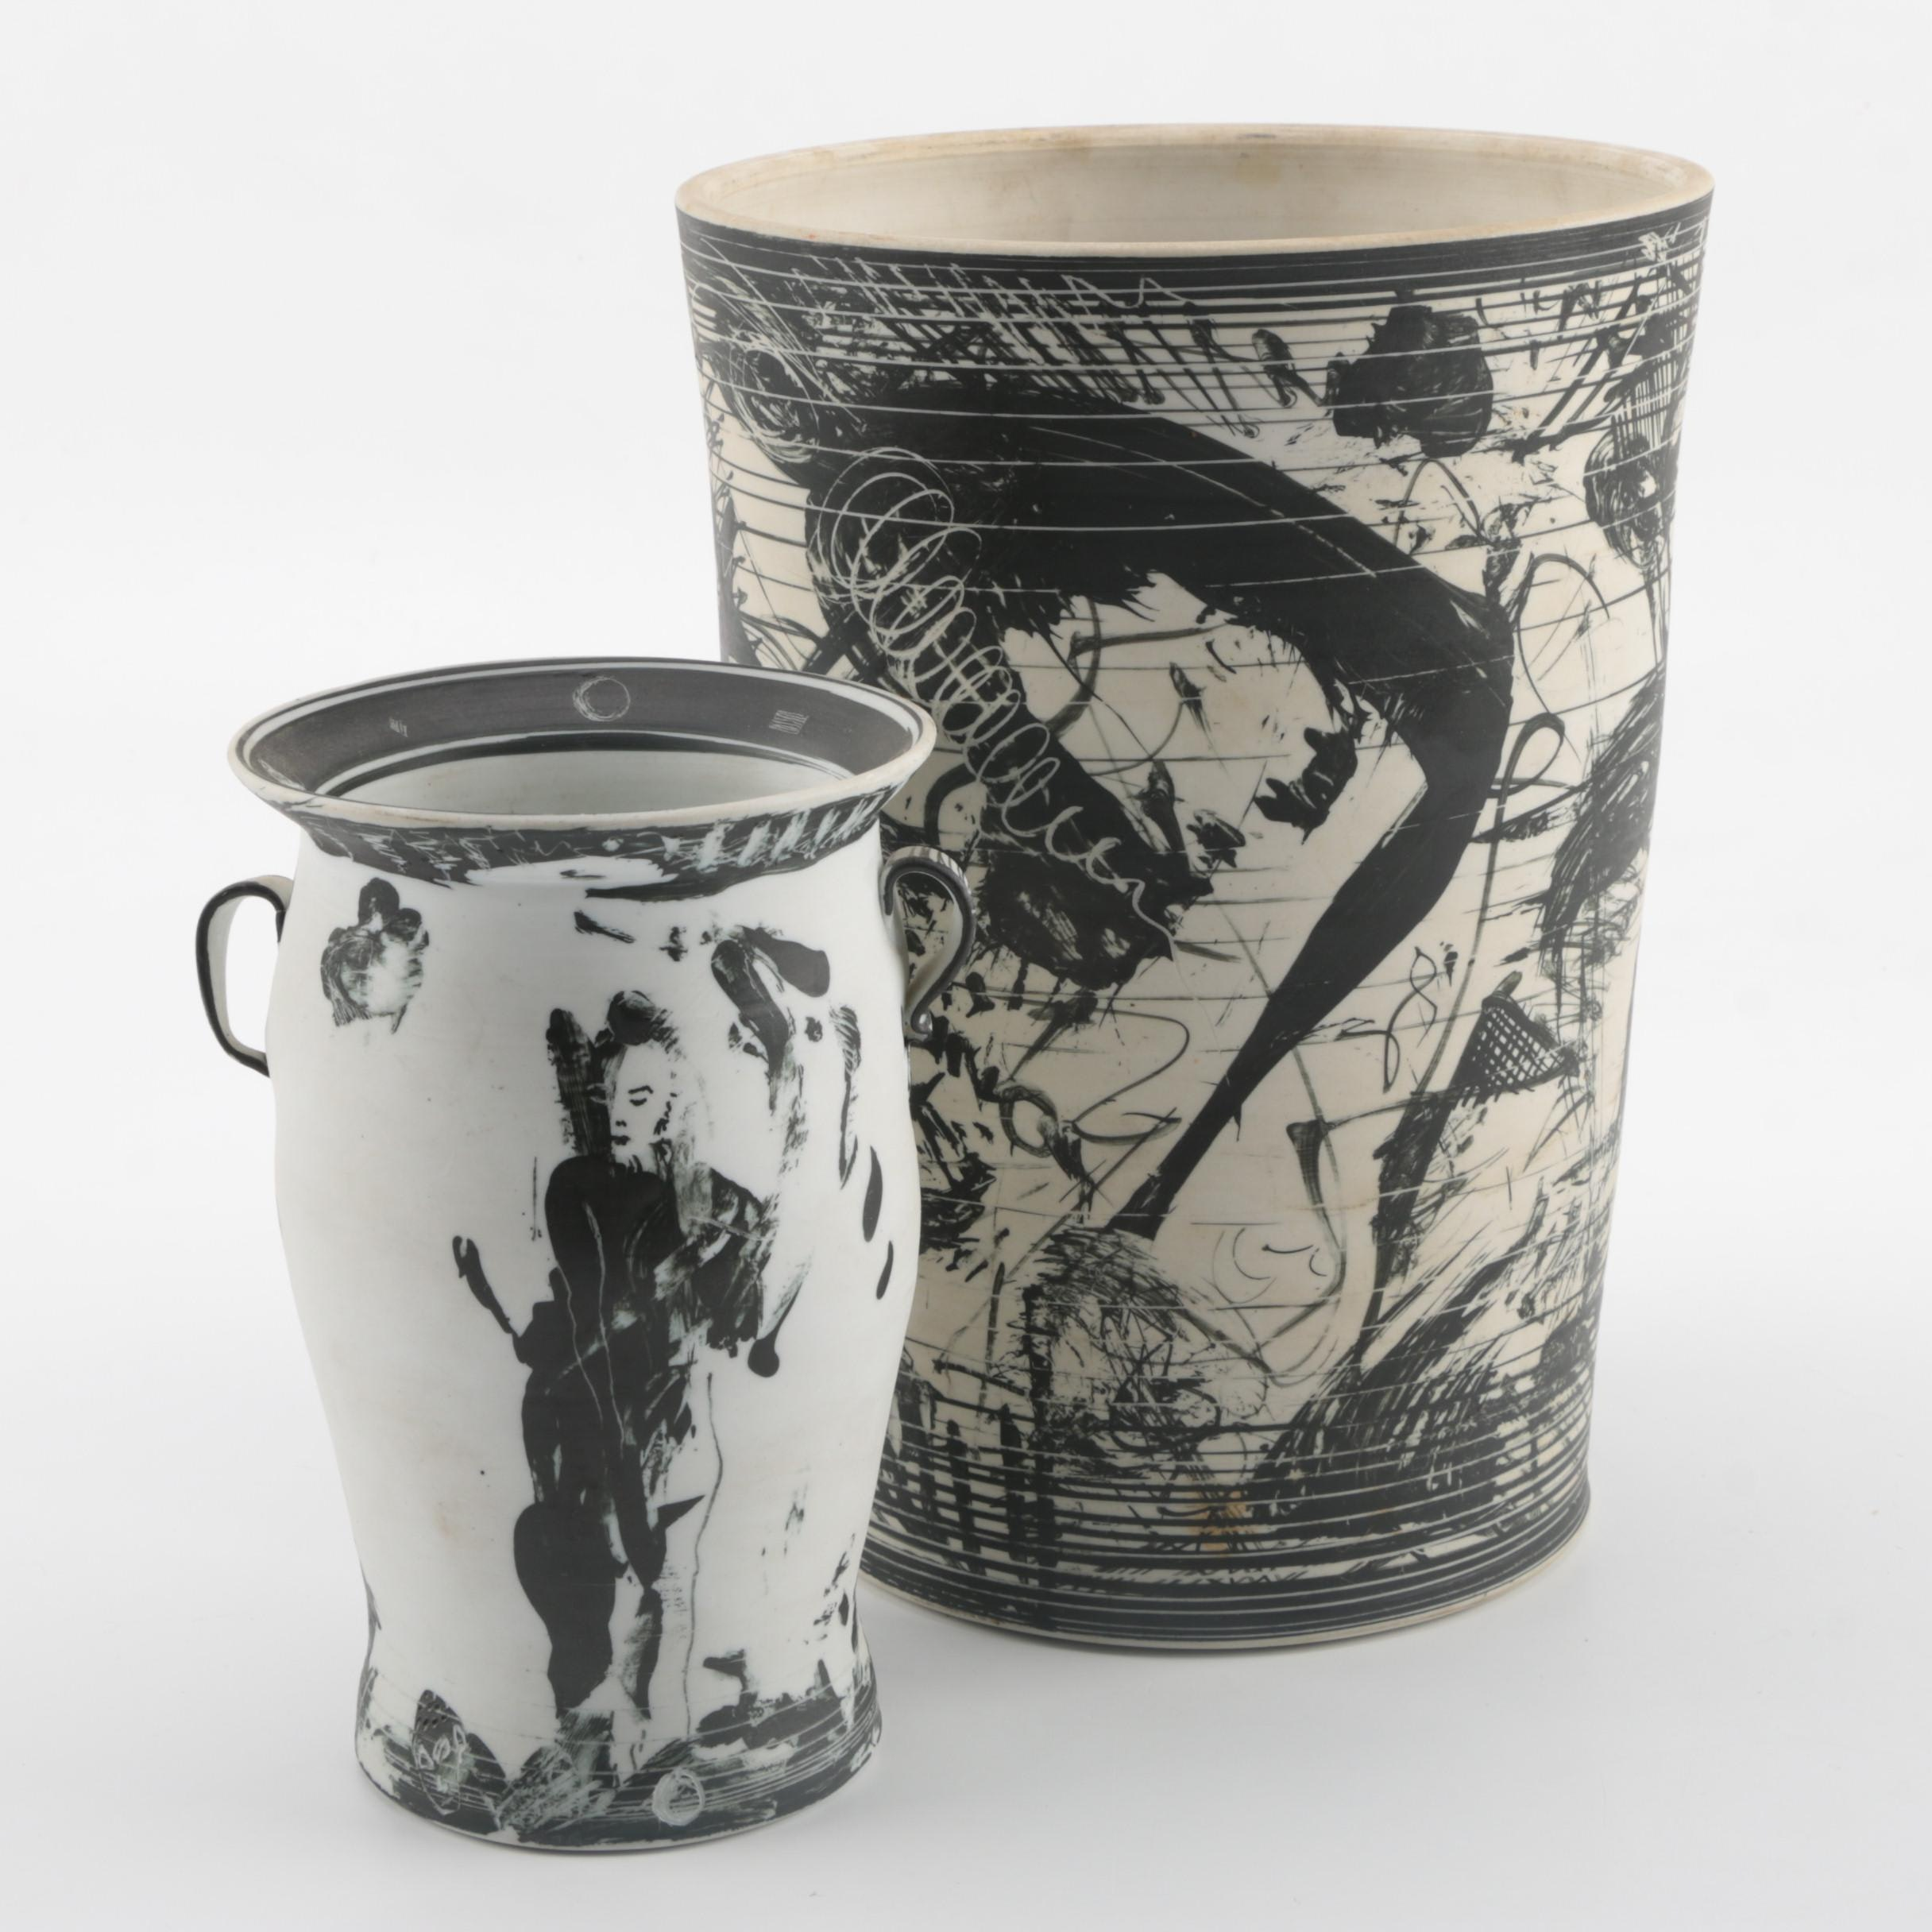 Signed Postmodern Edward S. Eberle Porcelain Vase